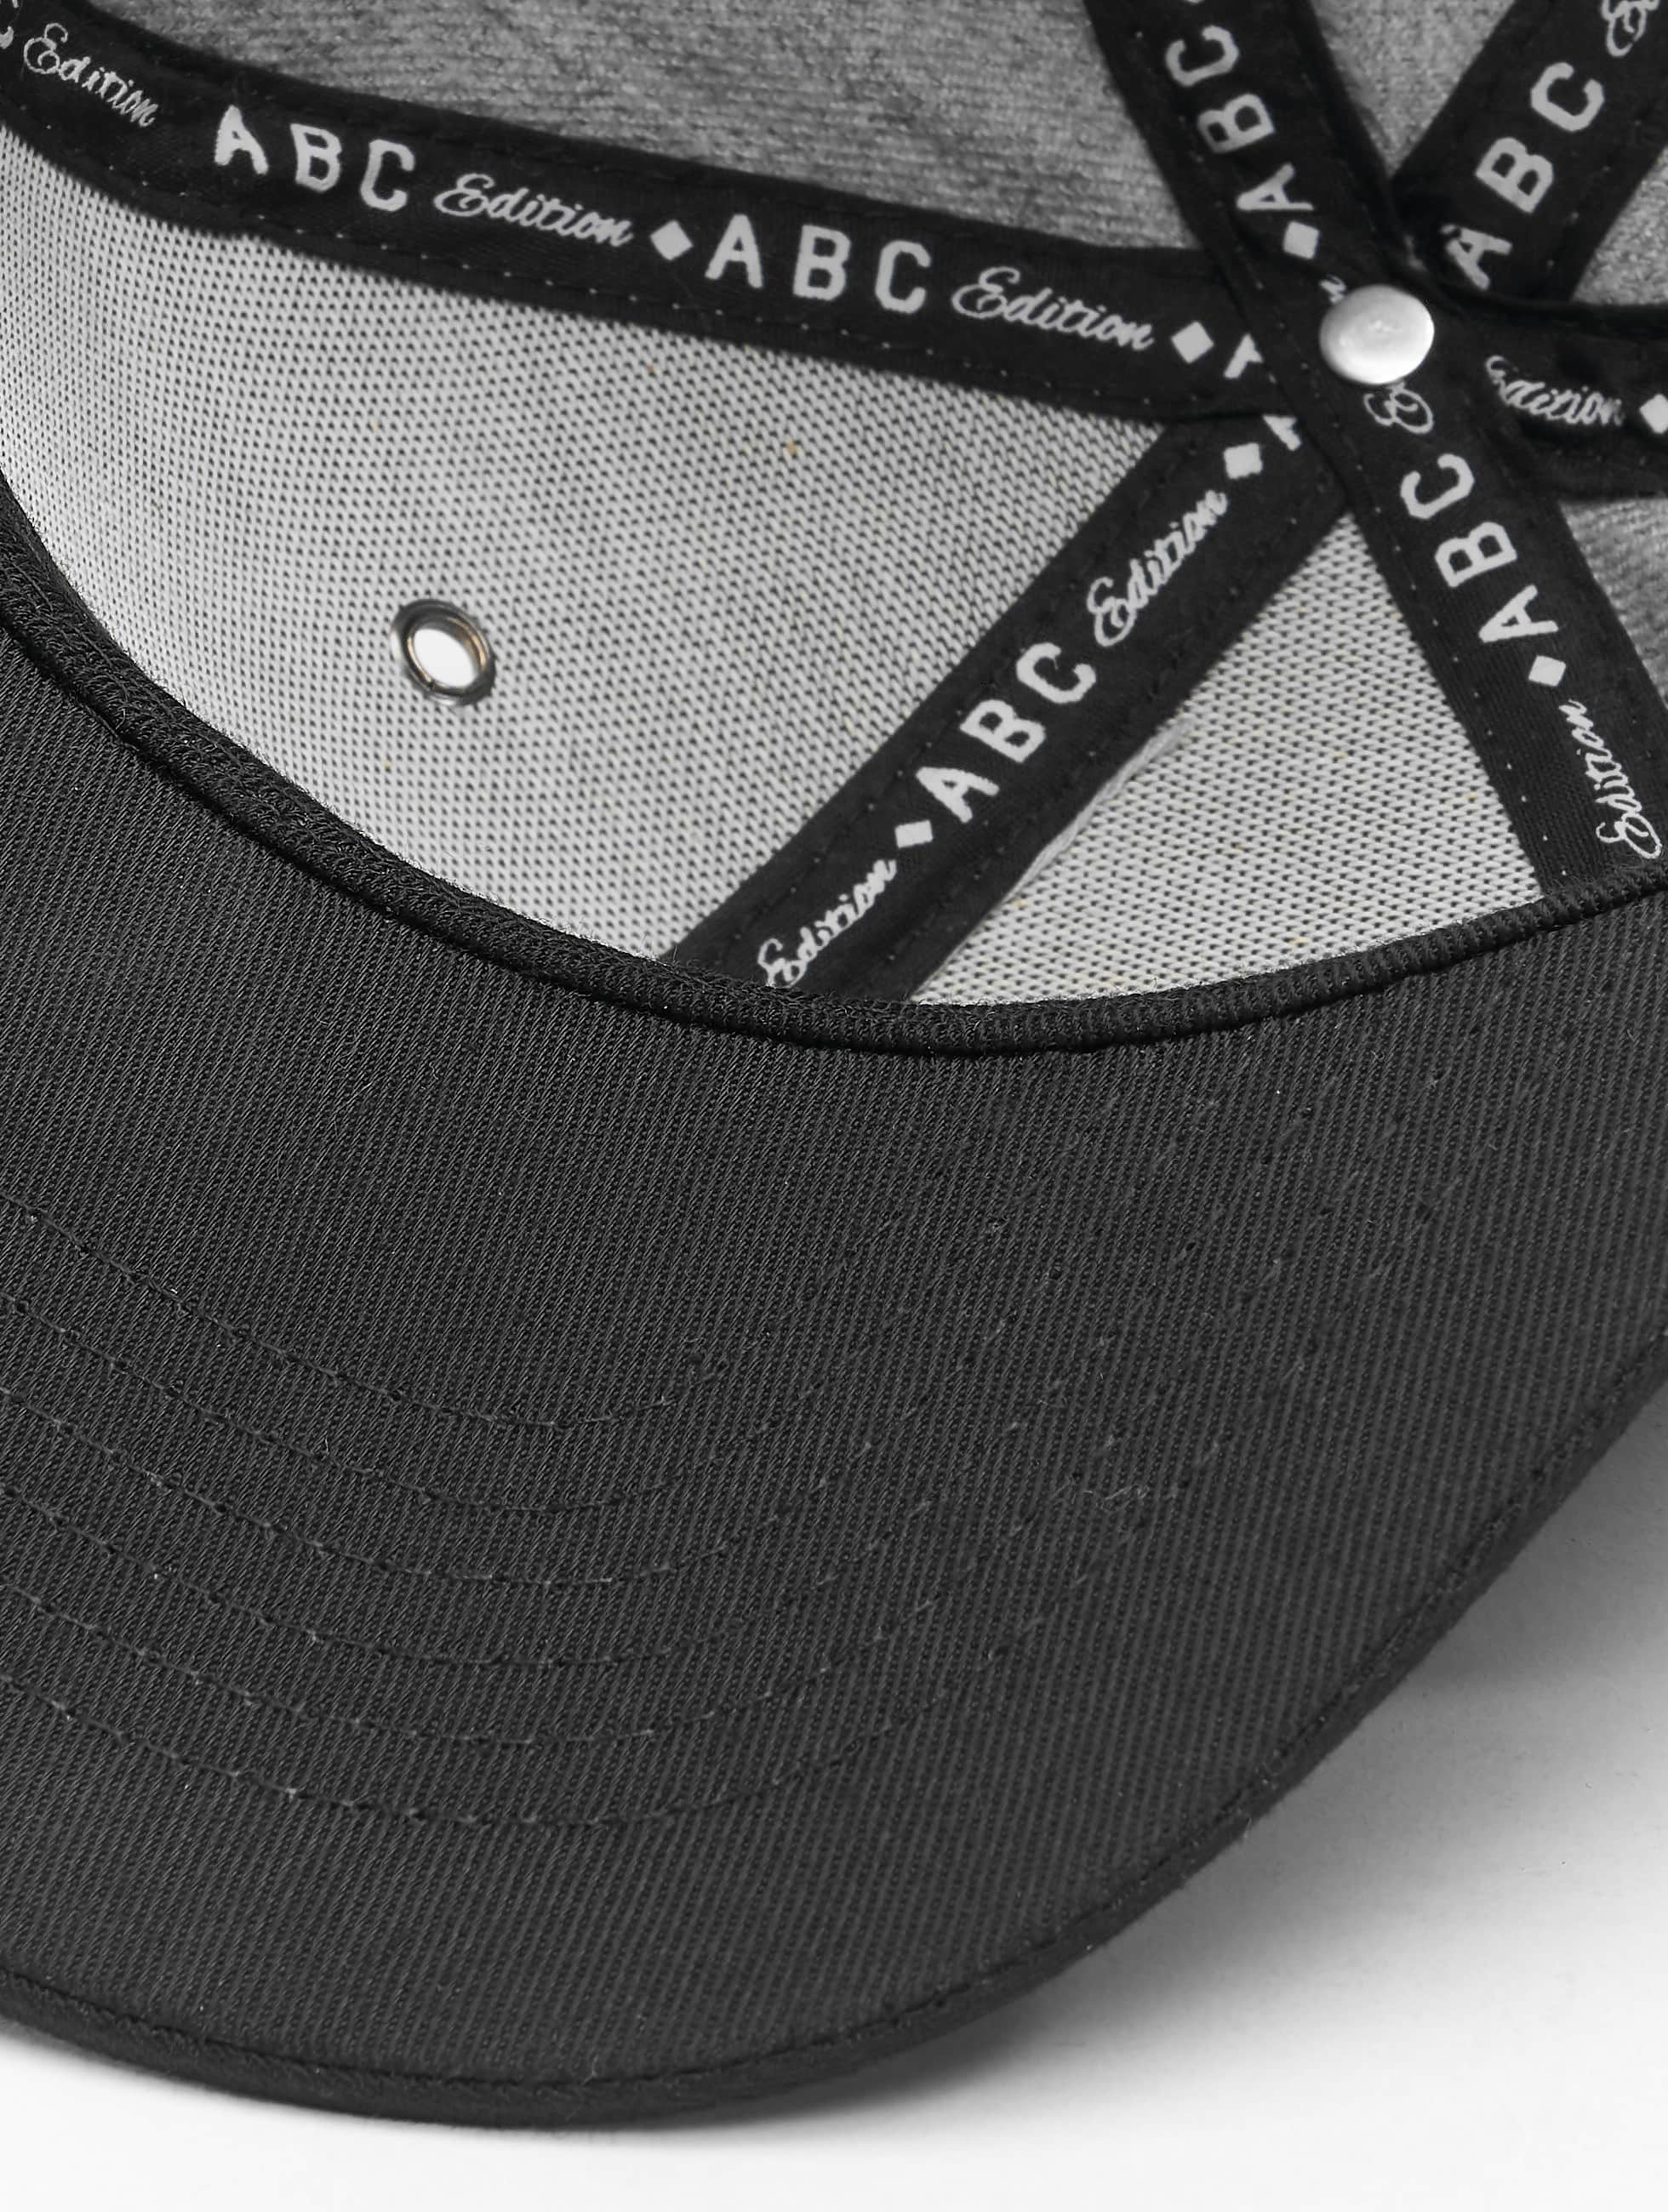 TrueSpin Casquette Snapback & Strapback ABC-U Wool gris